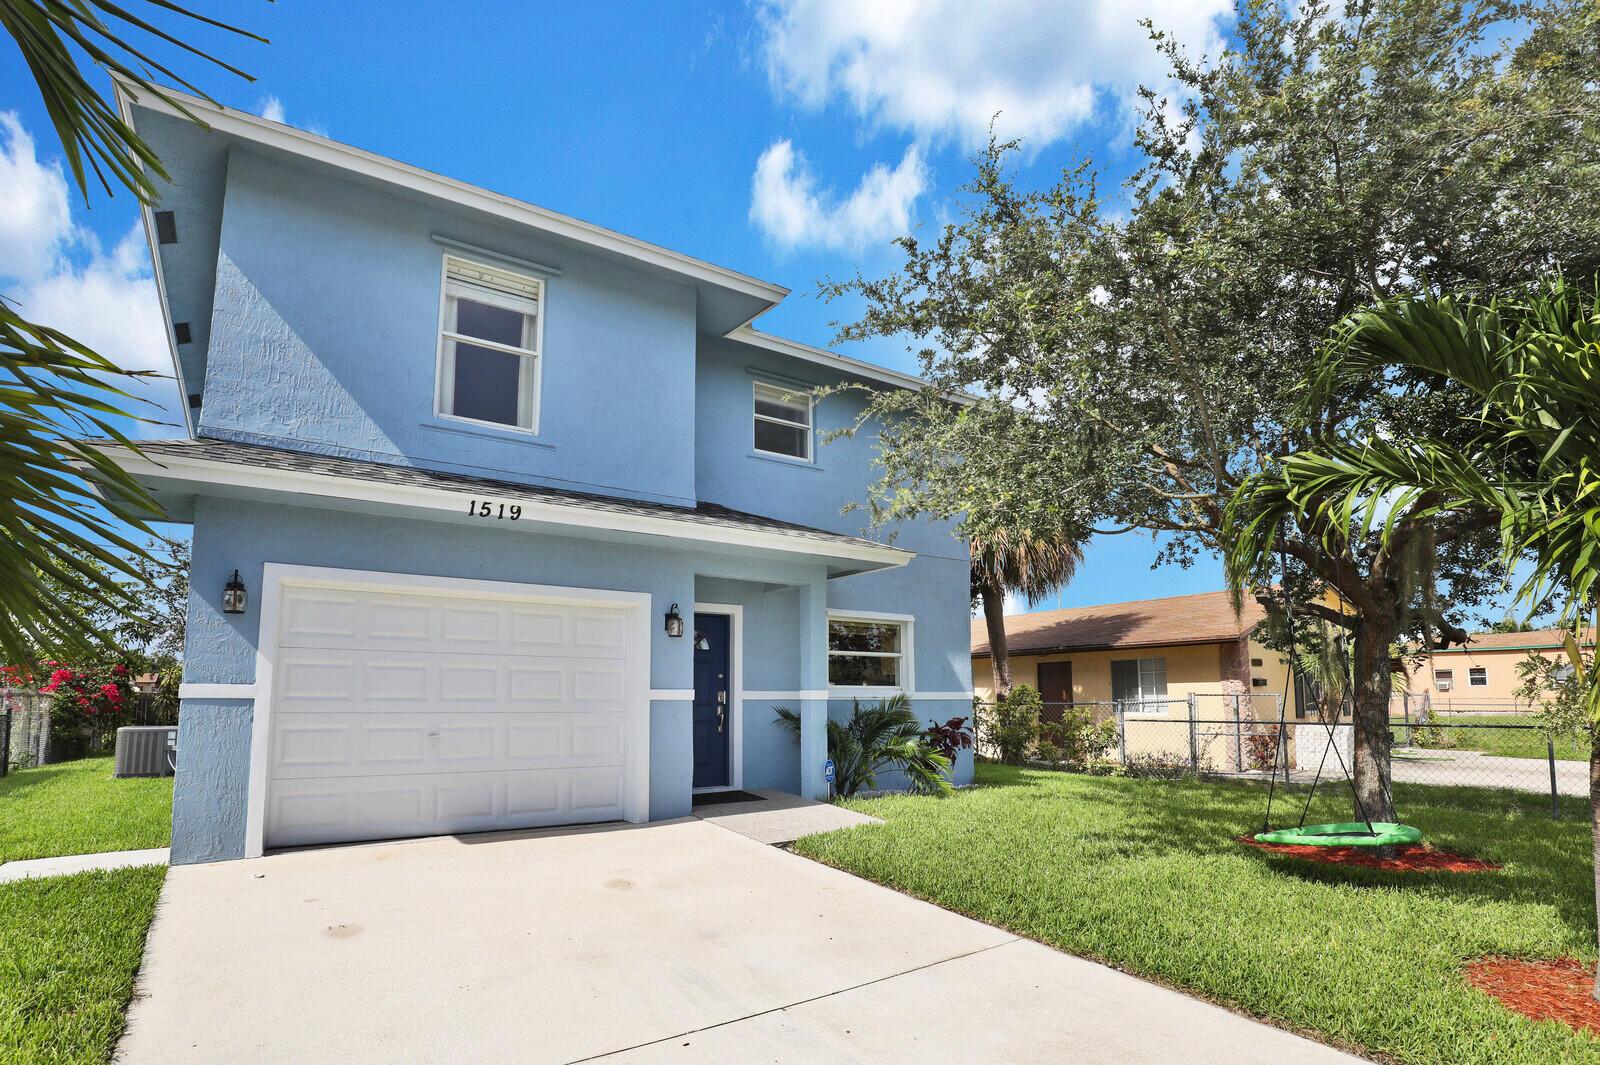 1519 W 17th Street  For Sale 10723947, FL